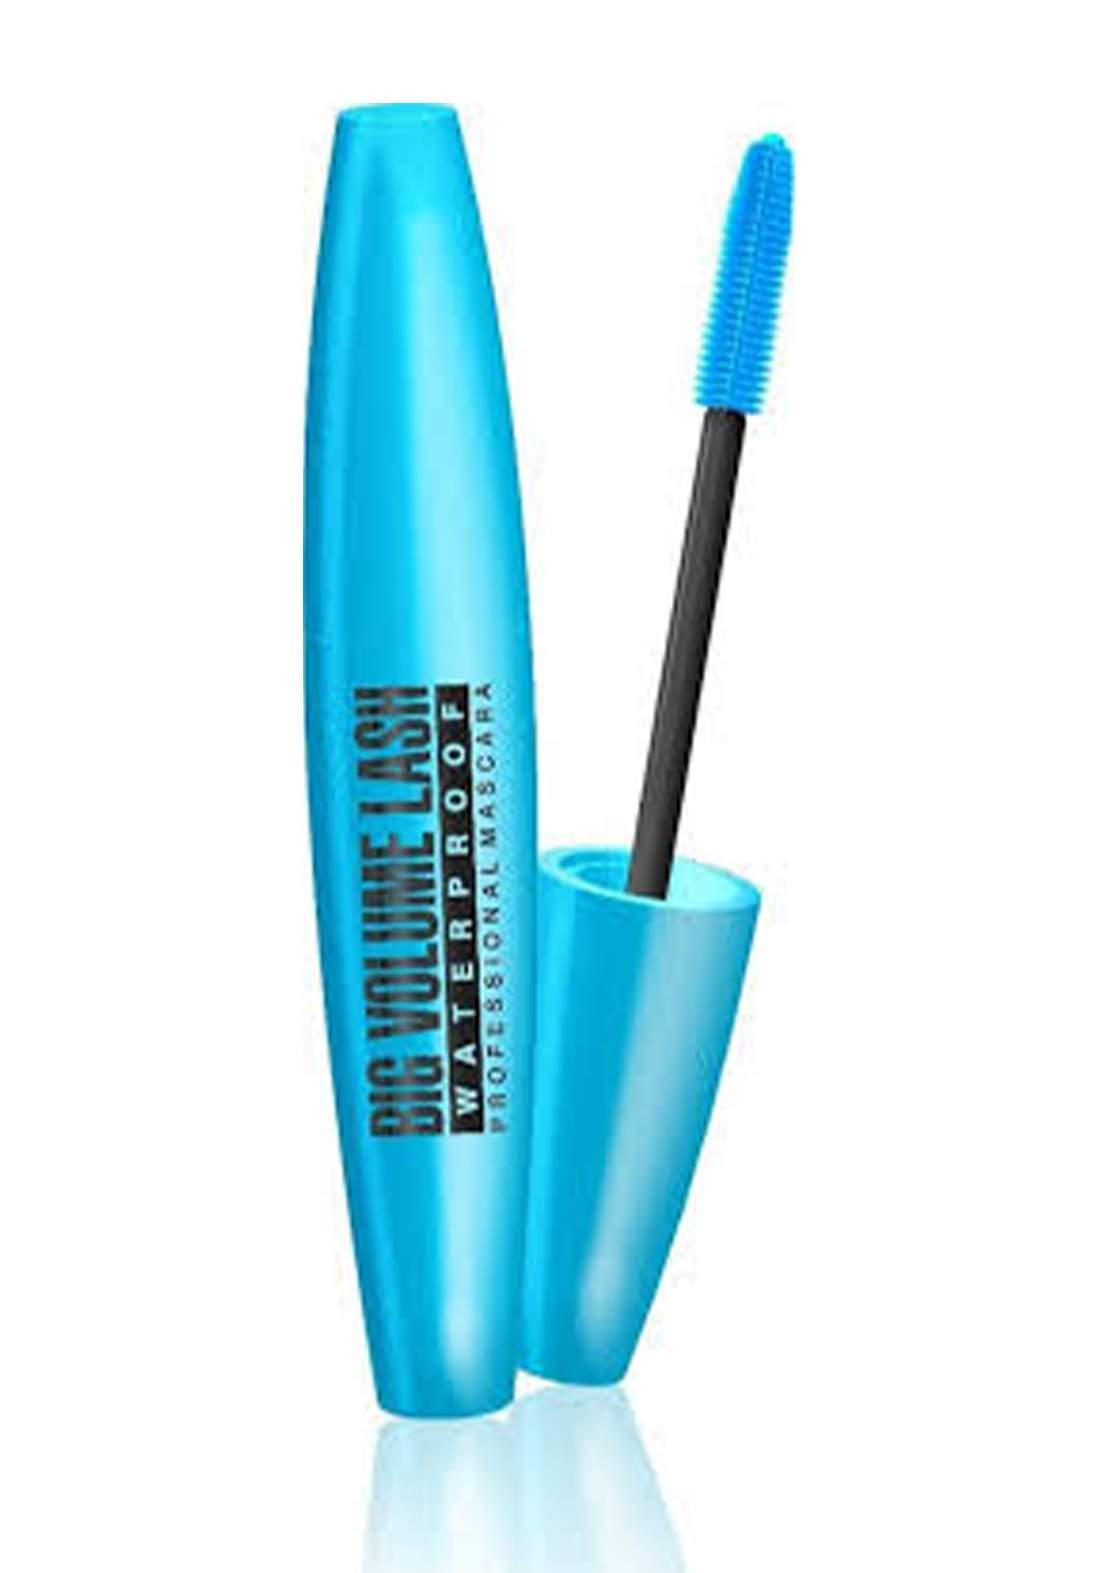 (095-0099)Eveline Mascara Big Volume Lashes Professional Waterproof 9ml مسكار